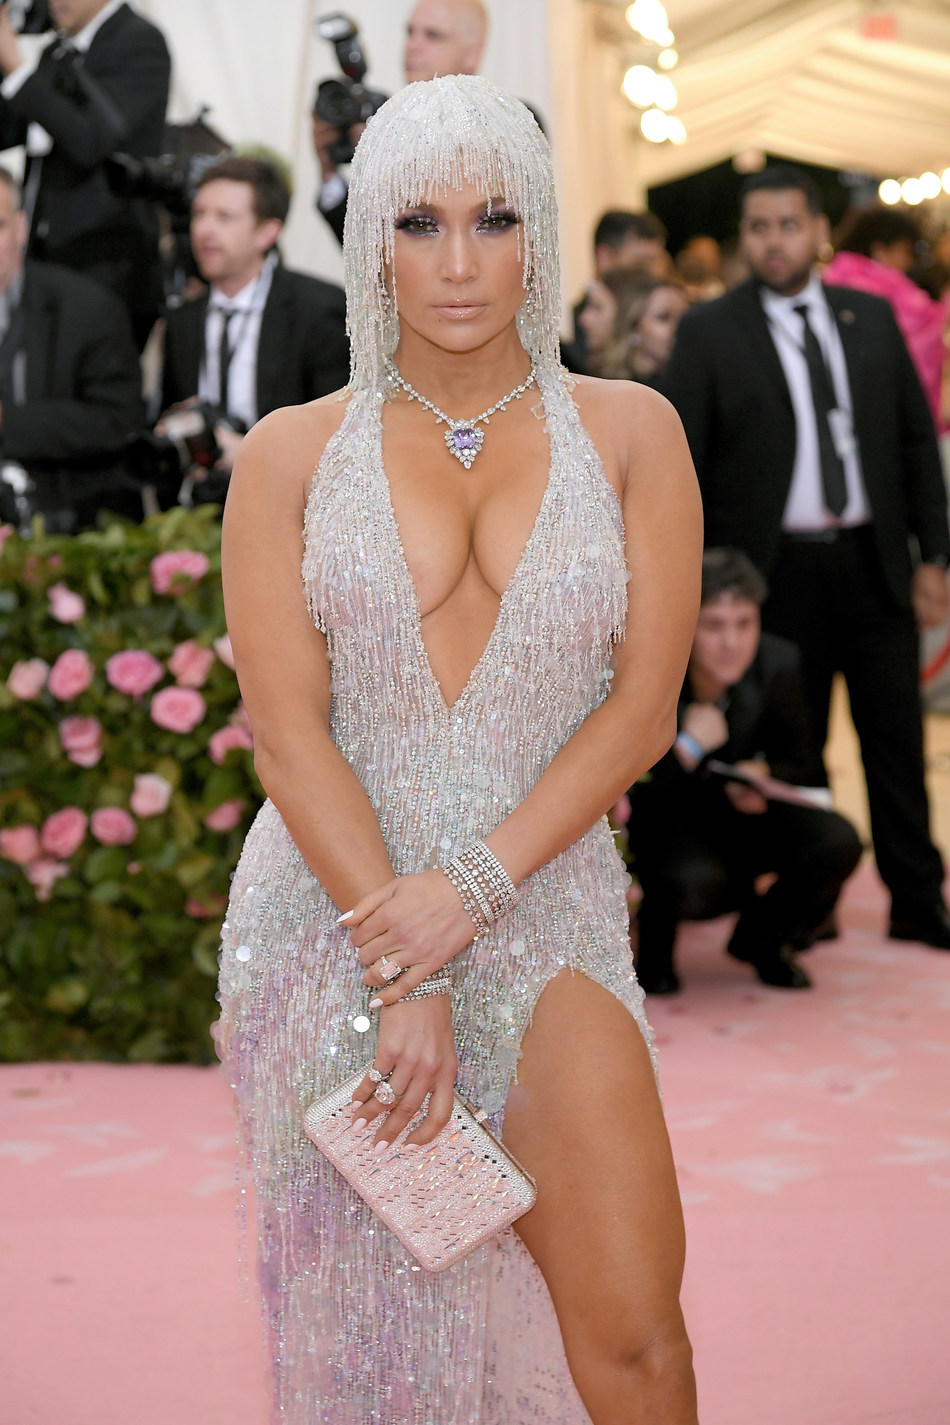 Jennifer Lopez Wears Platinum Jewelry to the MET Gala #BePlatinum (Photo by Neilson Barnard/Getty Images)